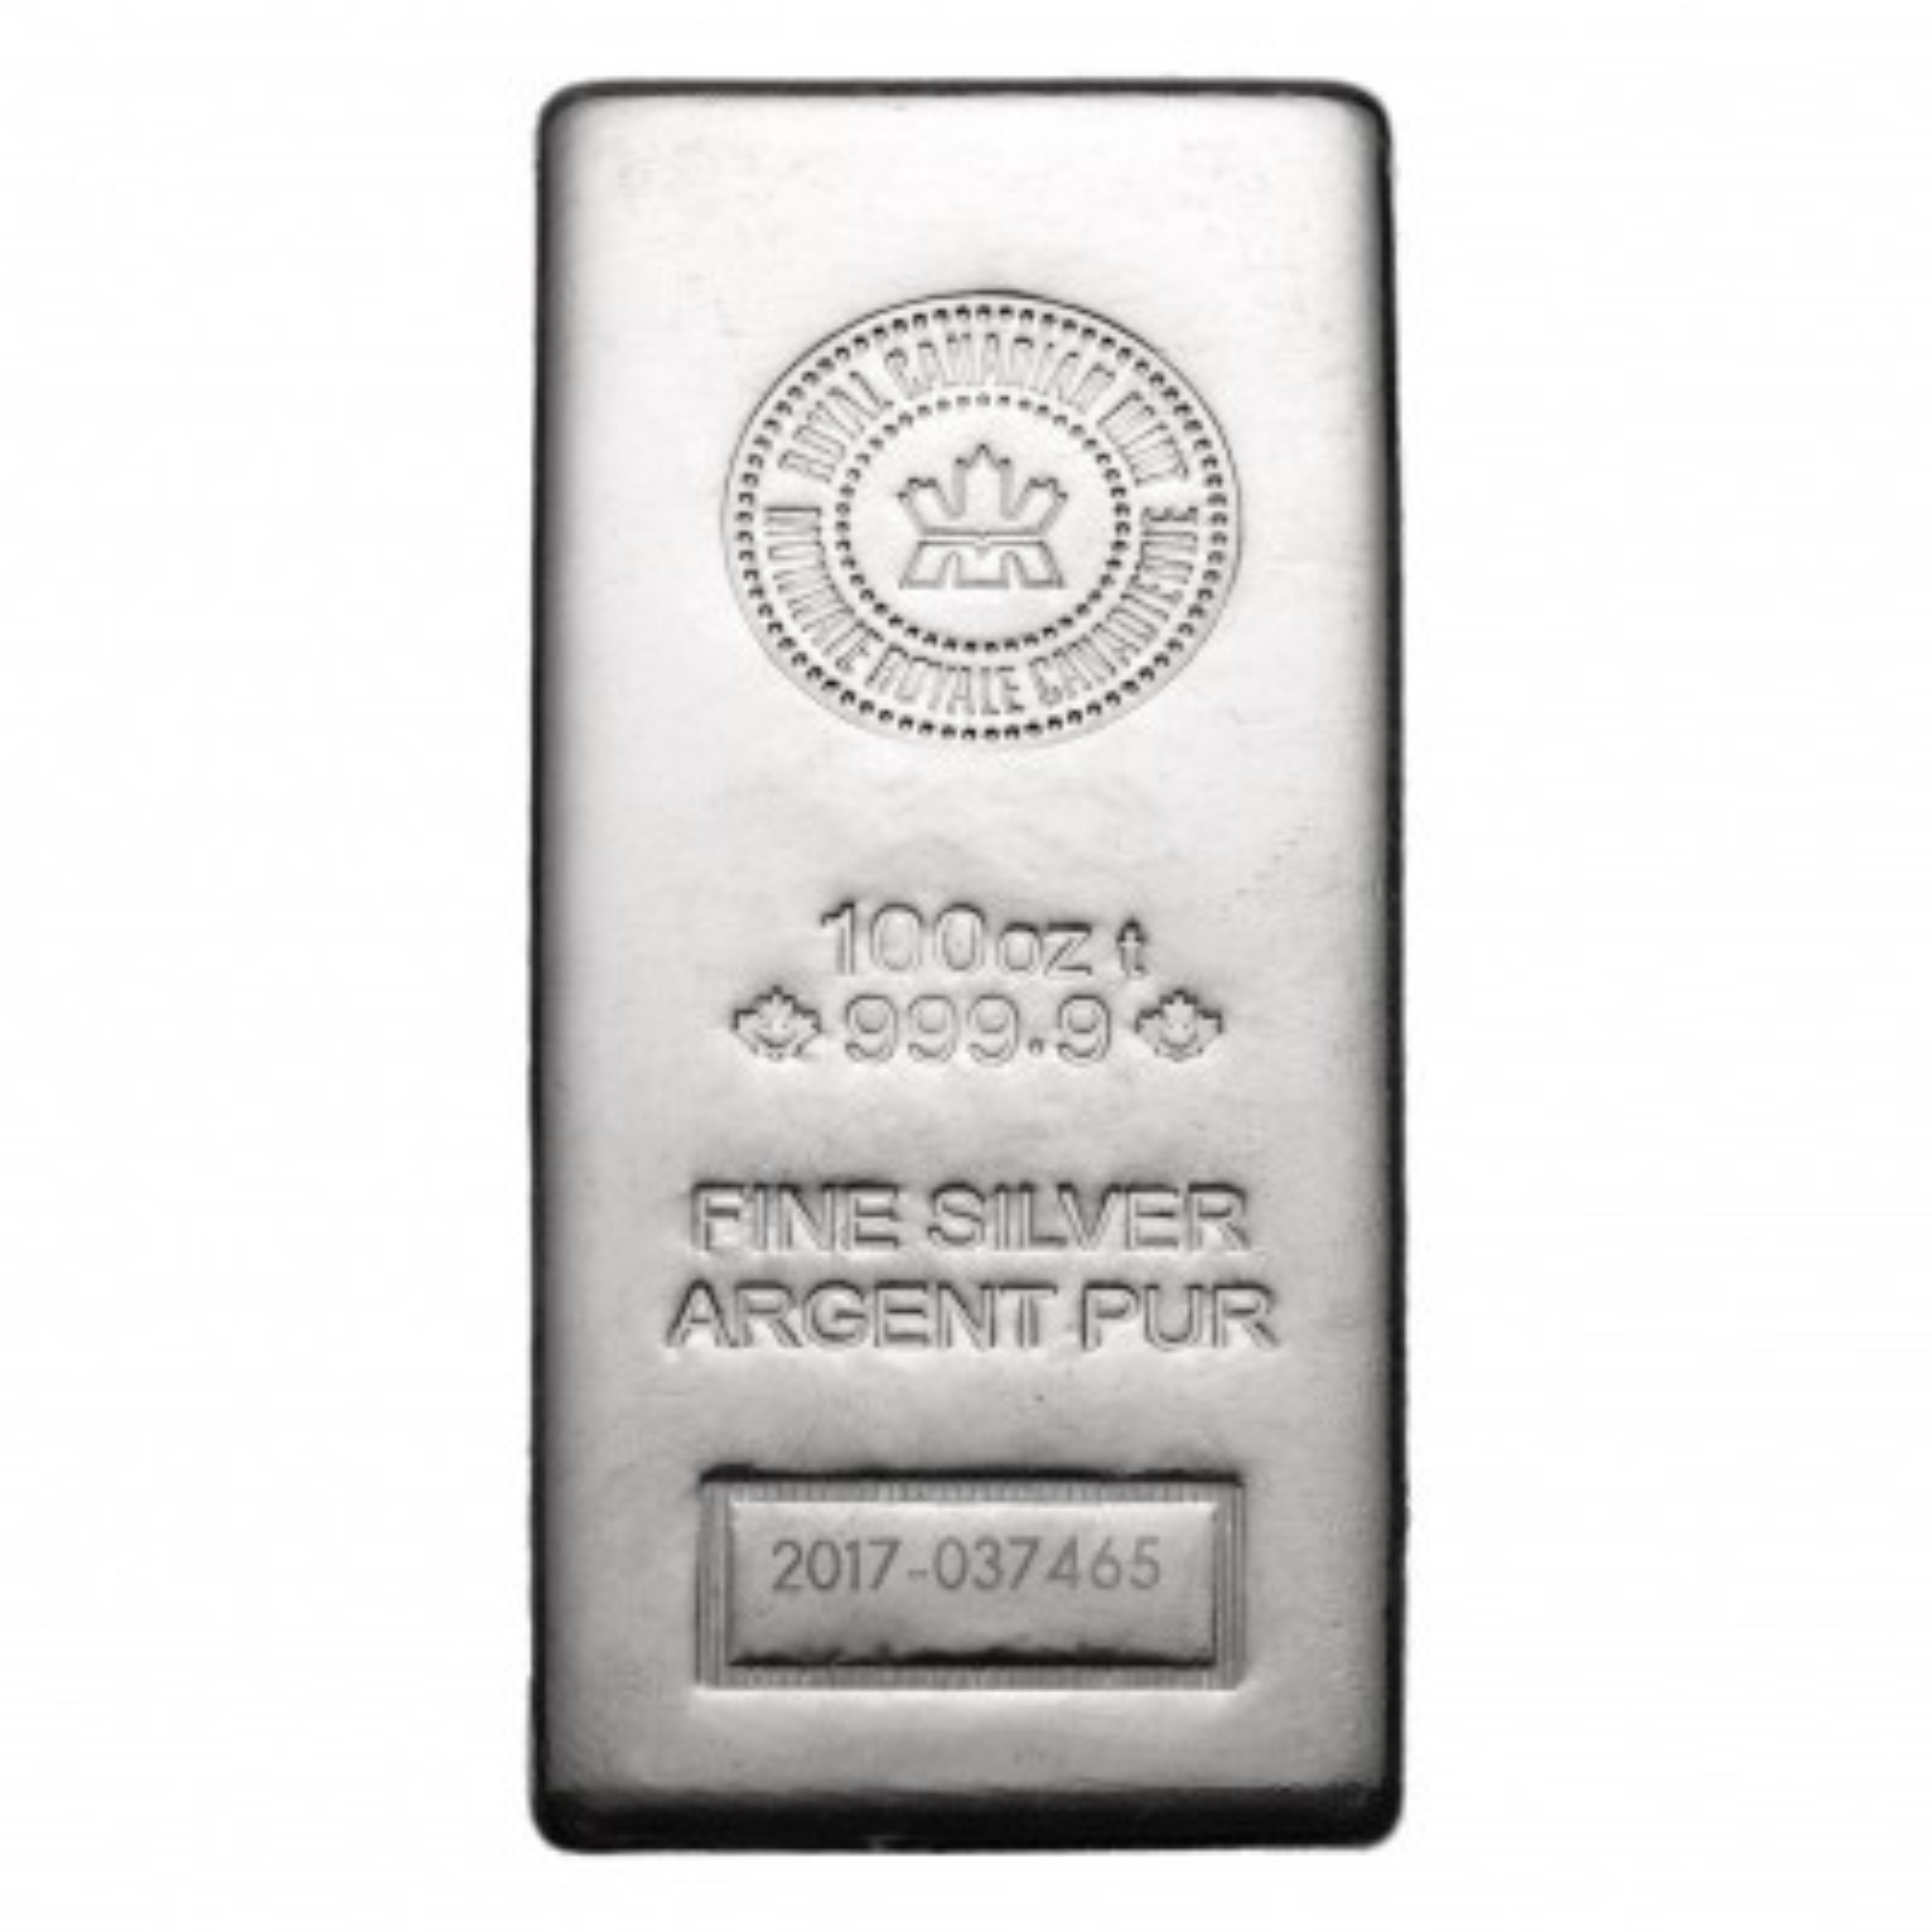 100 Troy ounce silver bar VAT-free Royal Canadian Mint